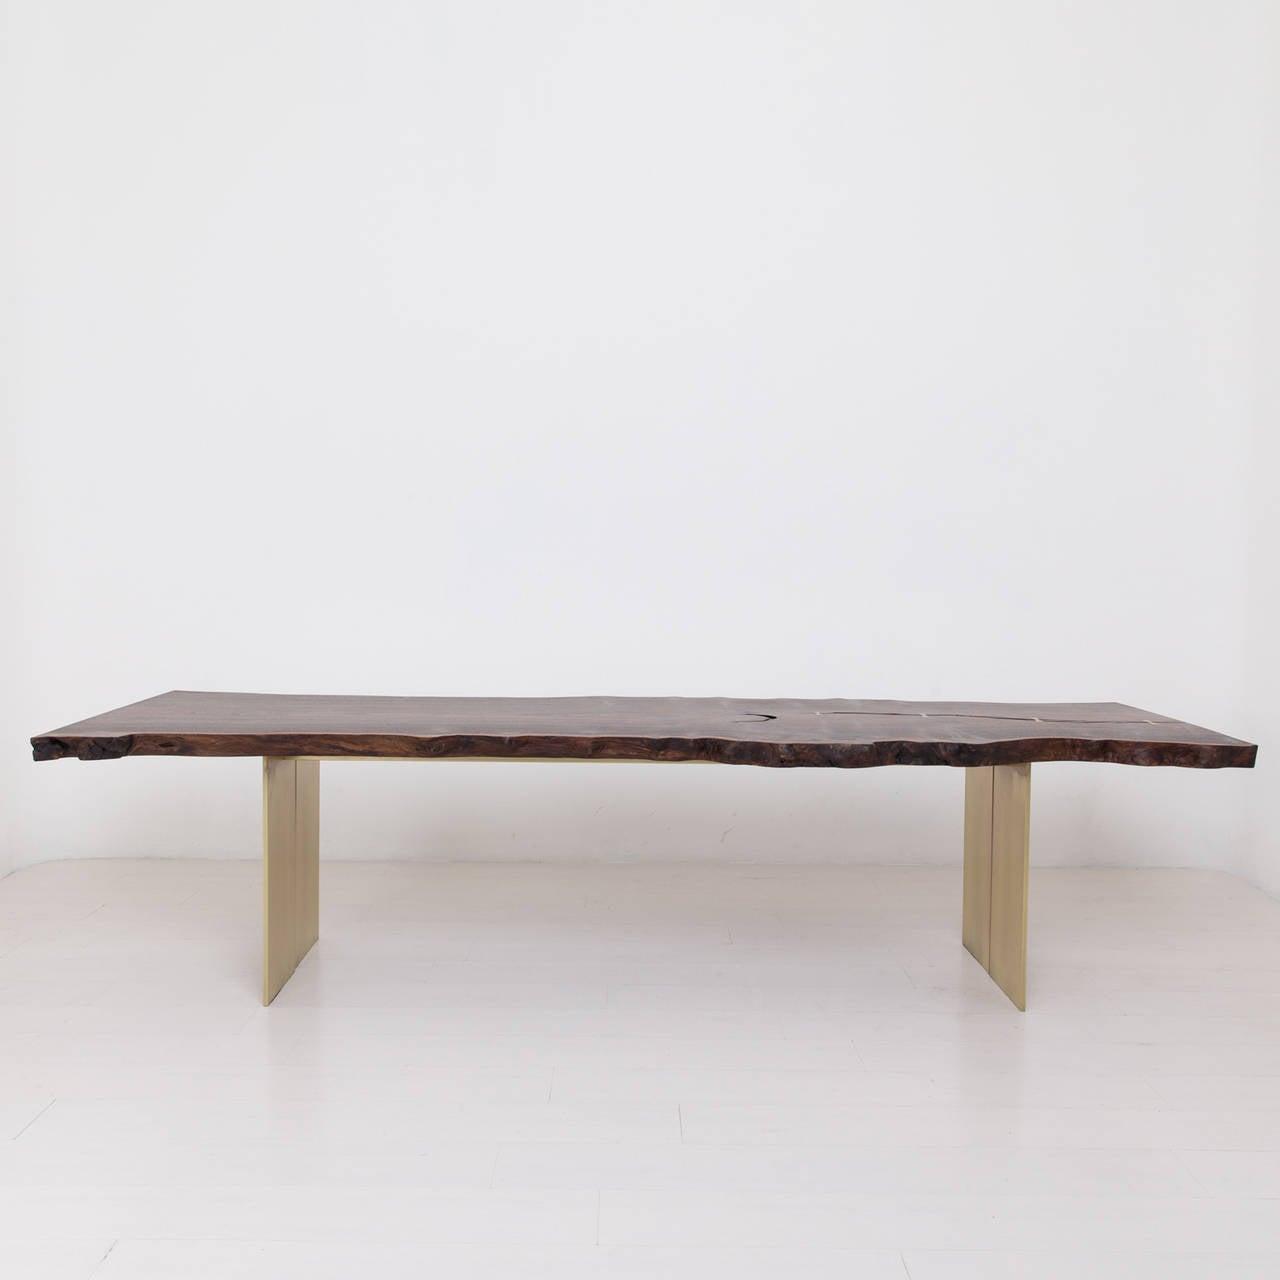 Milo Base Dining Table by Uhuru Design, claro walnut, brass 3